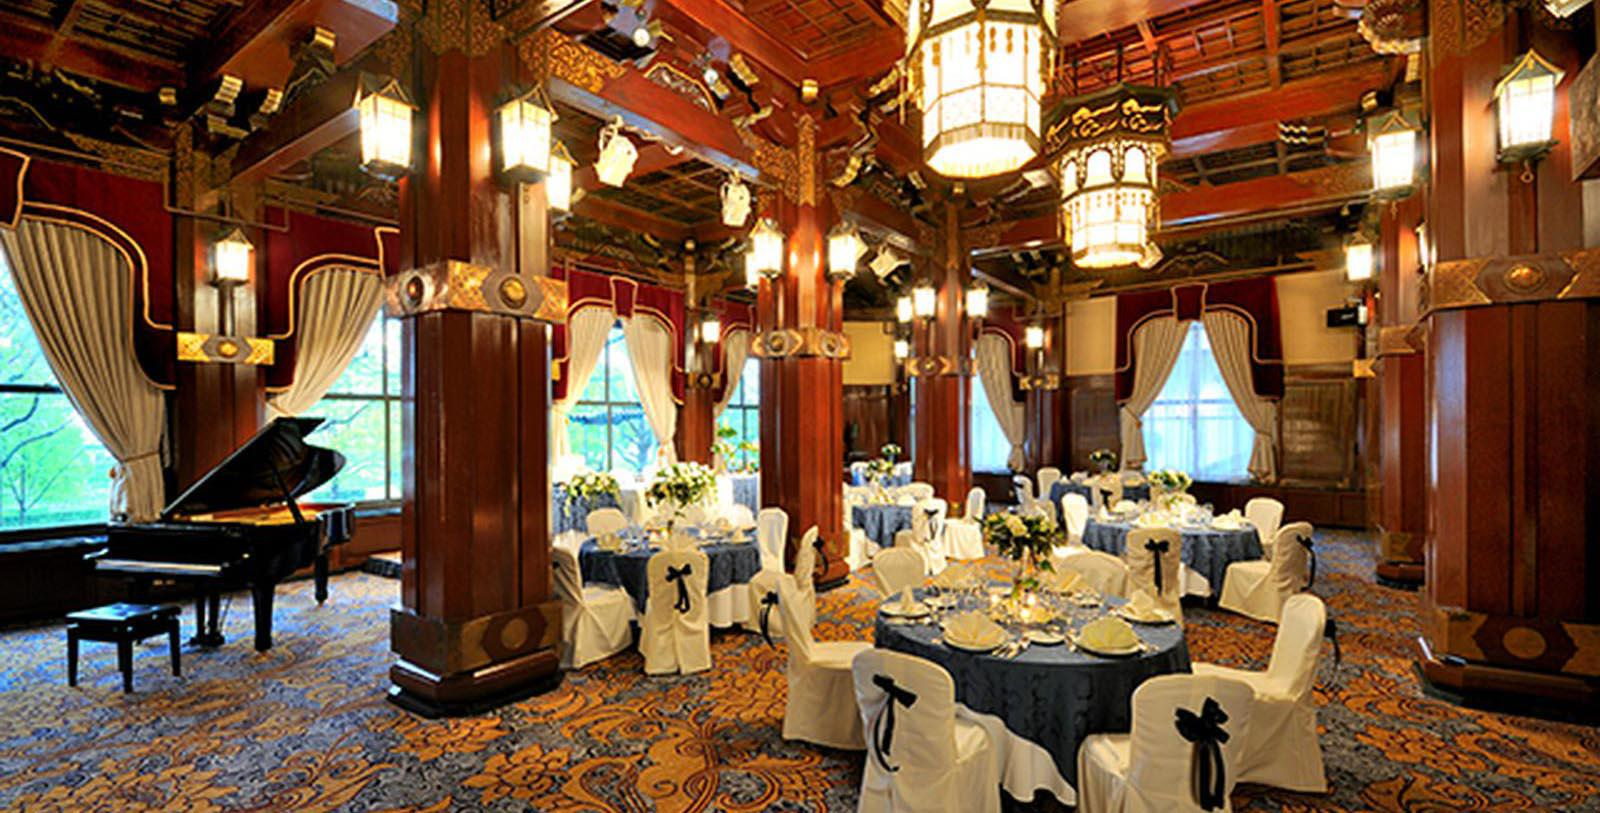 Image of Rainbow Ball Room, Yokohama, Japan, 1927, Member of Historic Hotels Worldwide, Experience